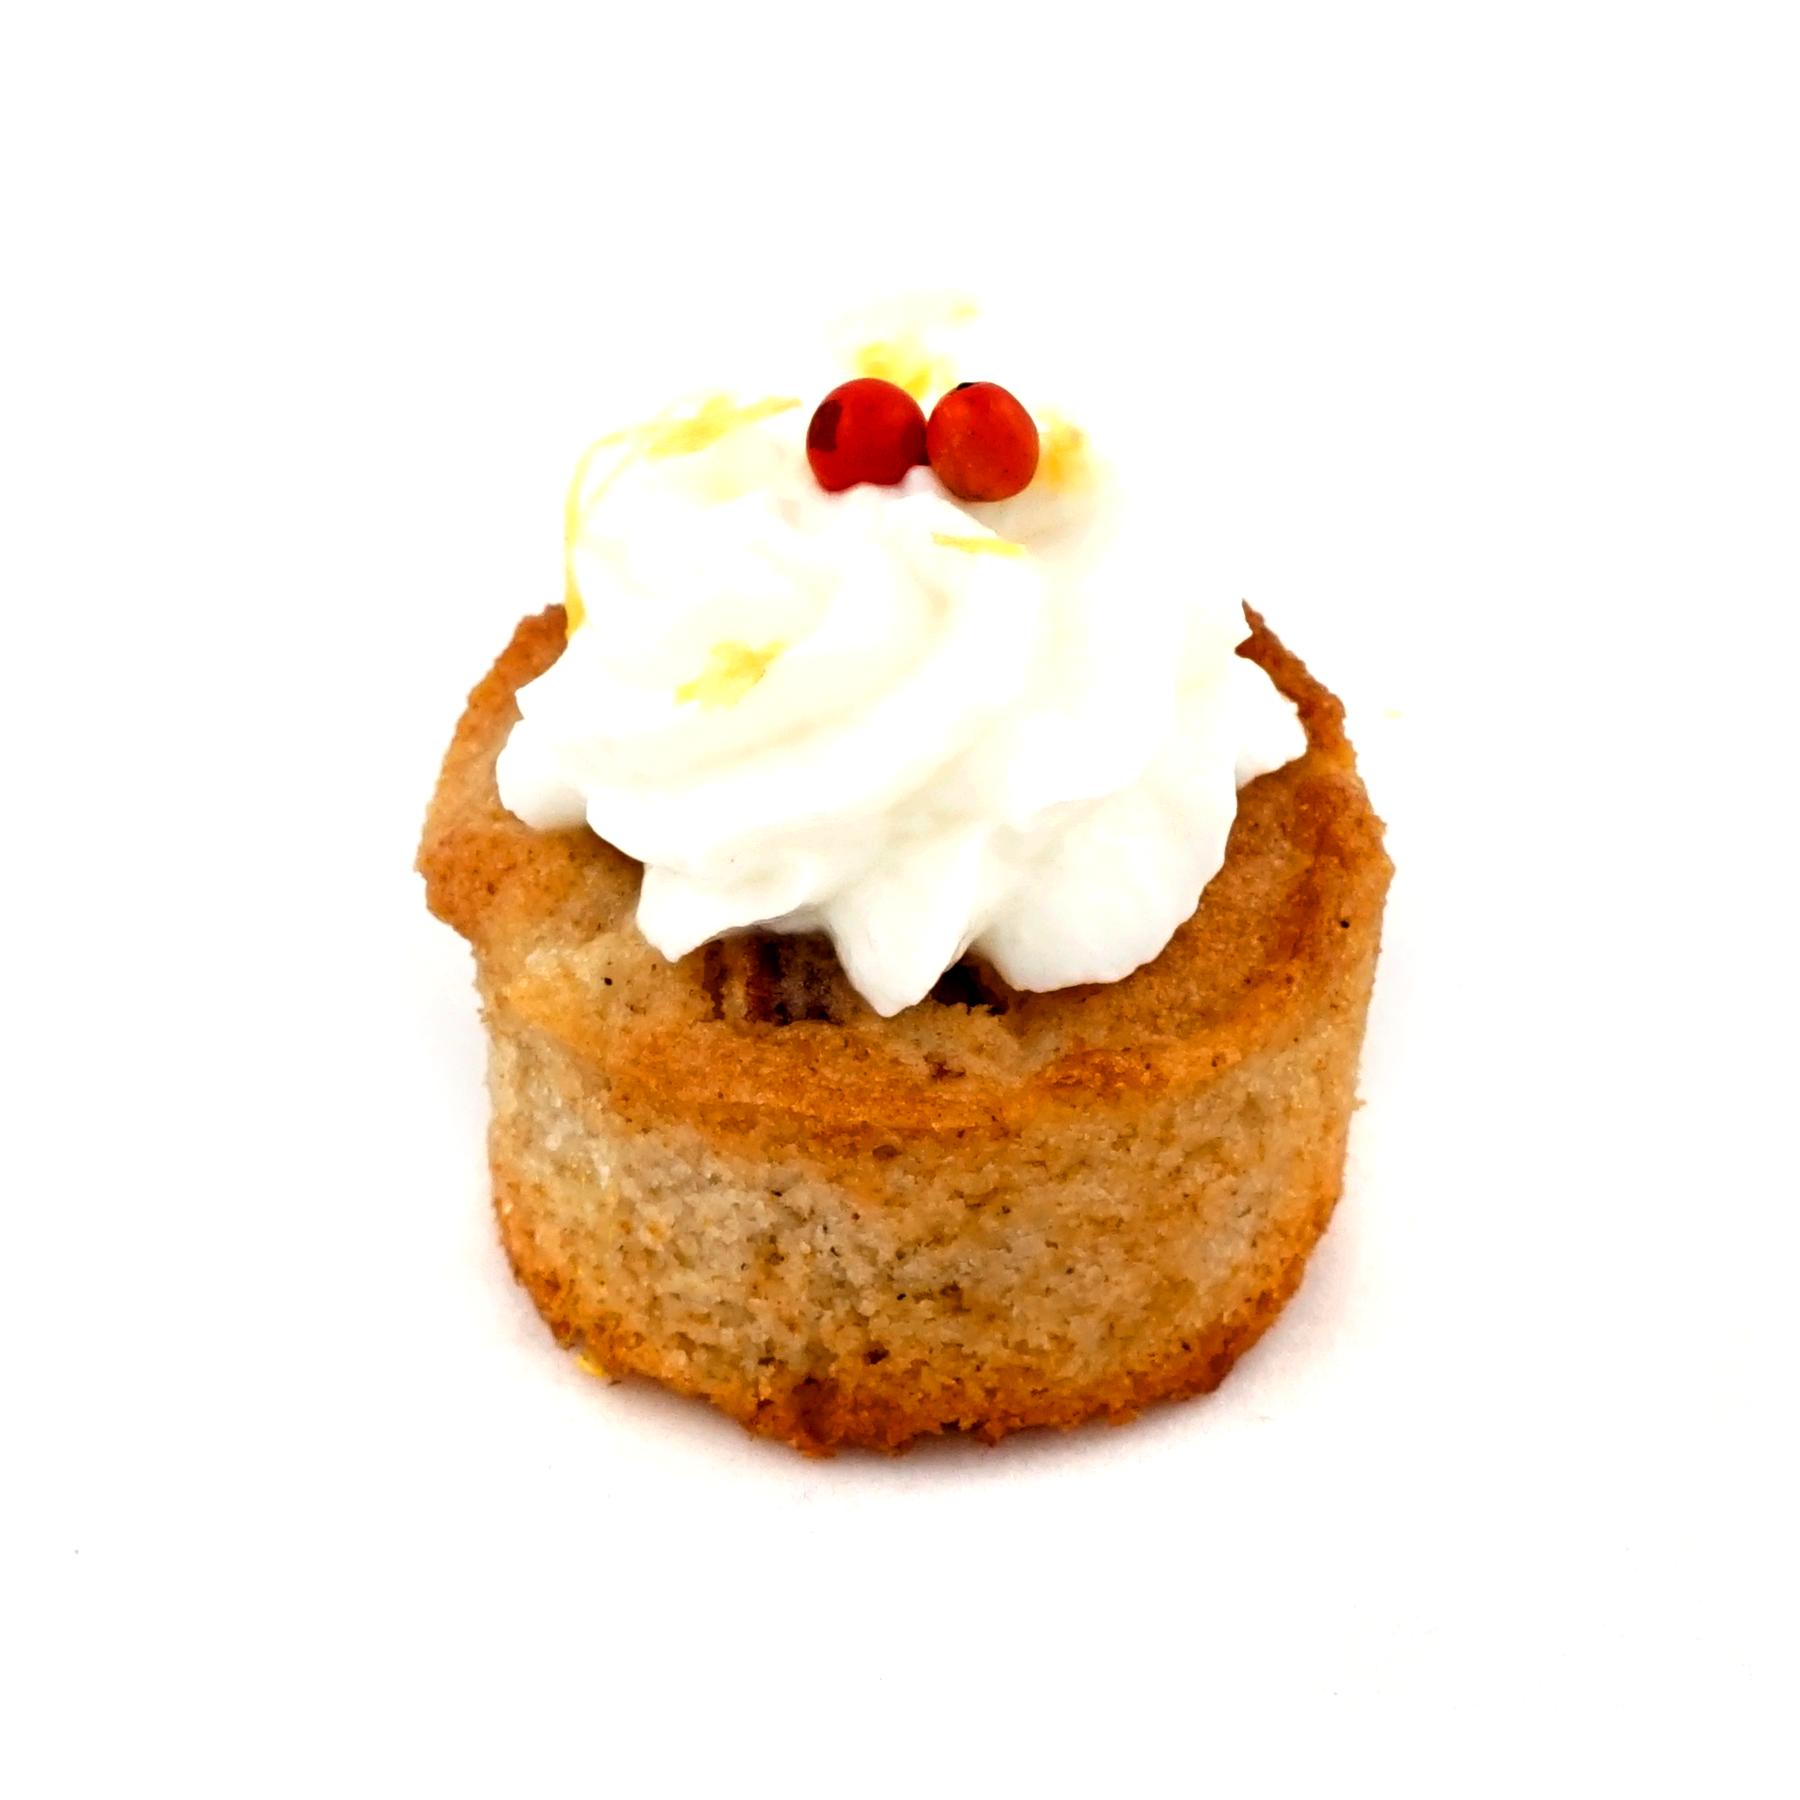 parsnip cakes